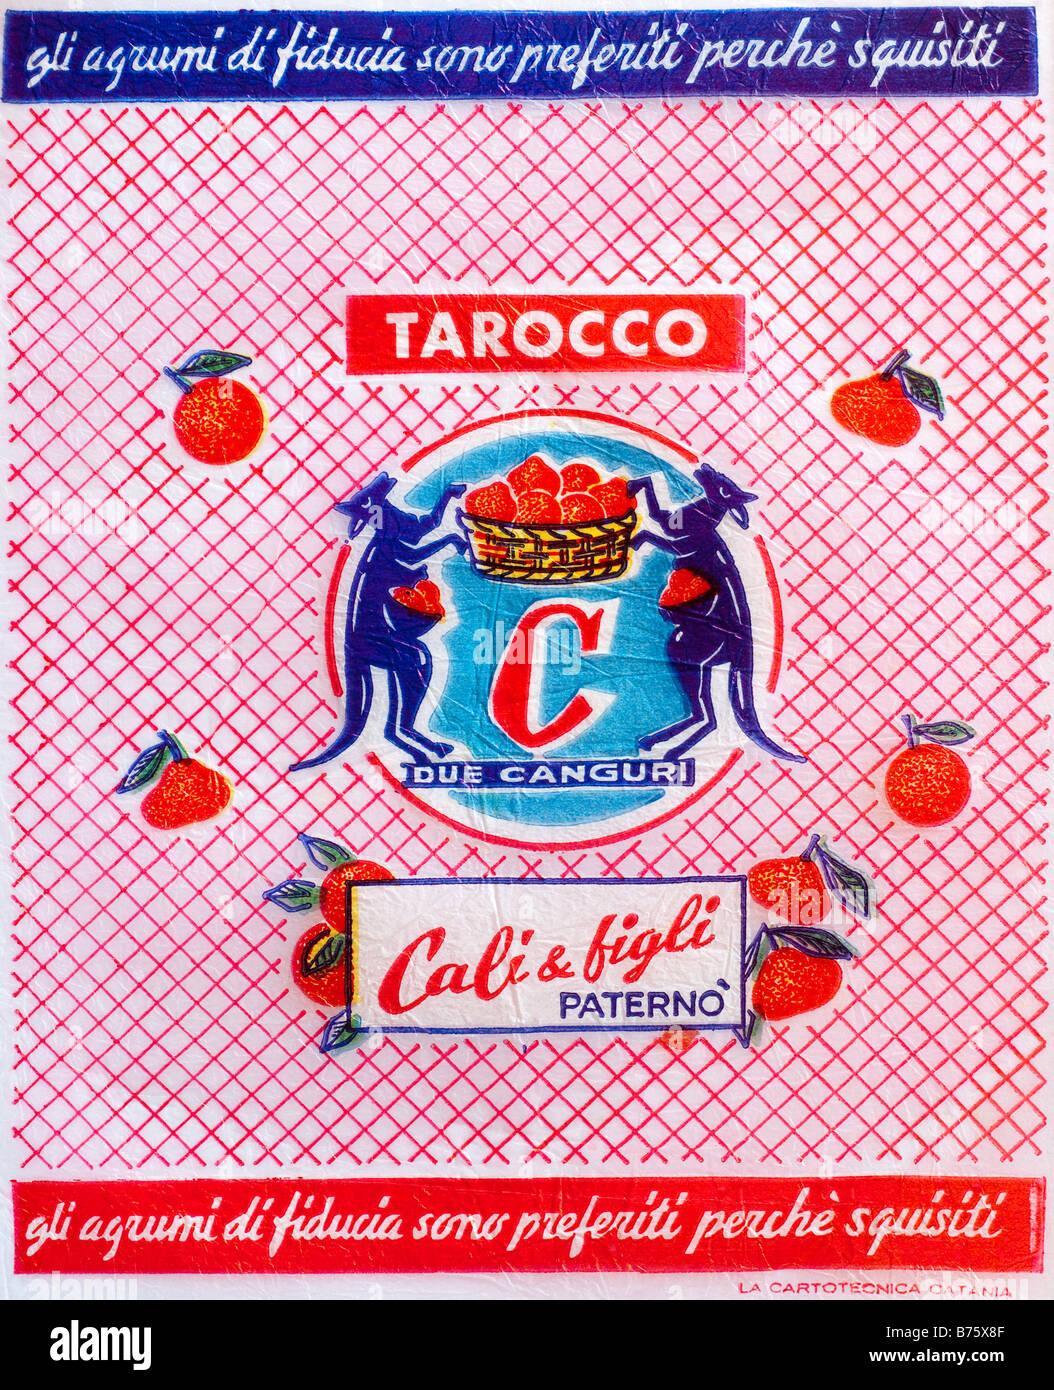 Printed ephemera / Citrus fruit wrapper from Italy - Kangaroos holding basket illustration on tissue paper. - Stock Image